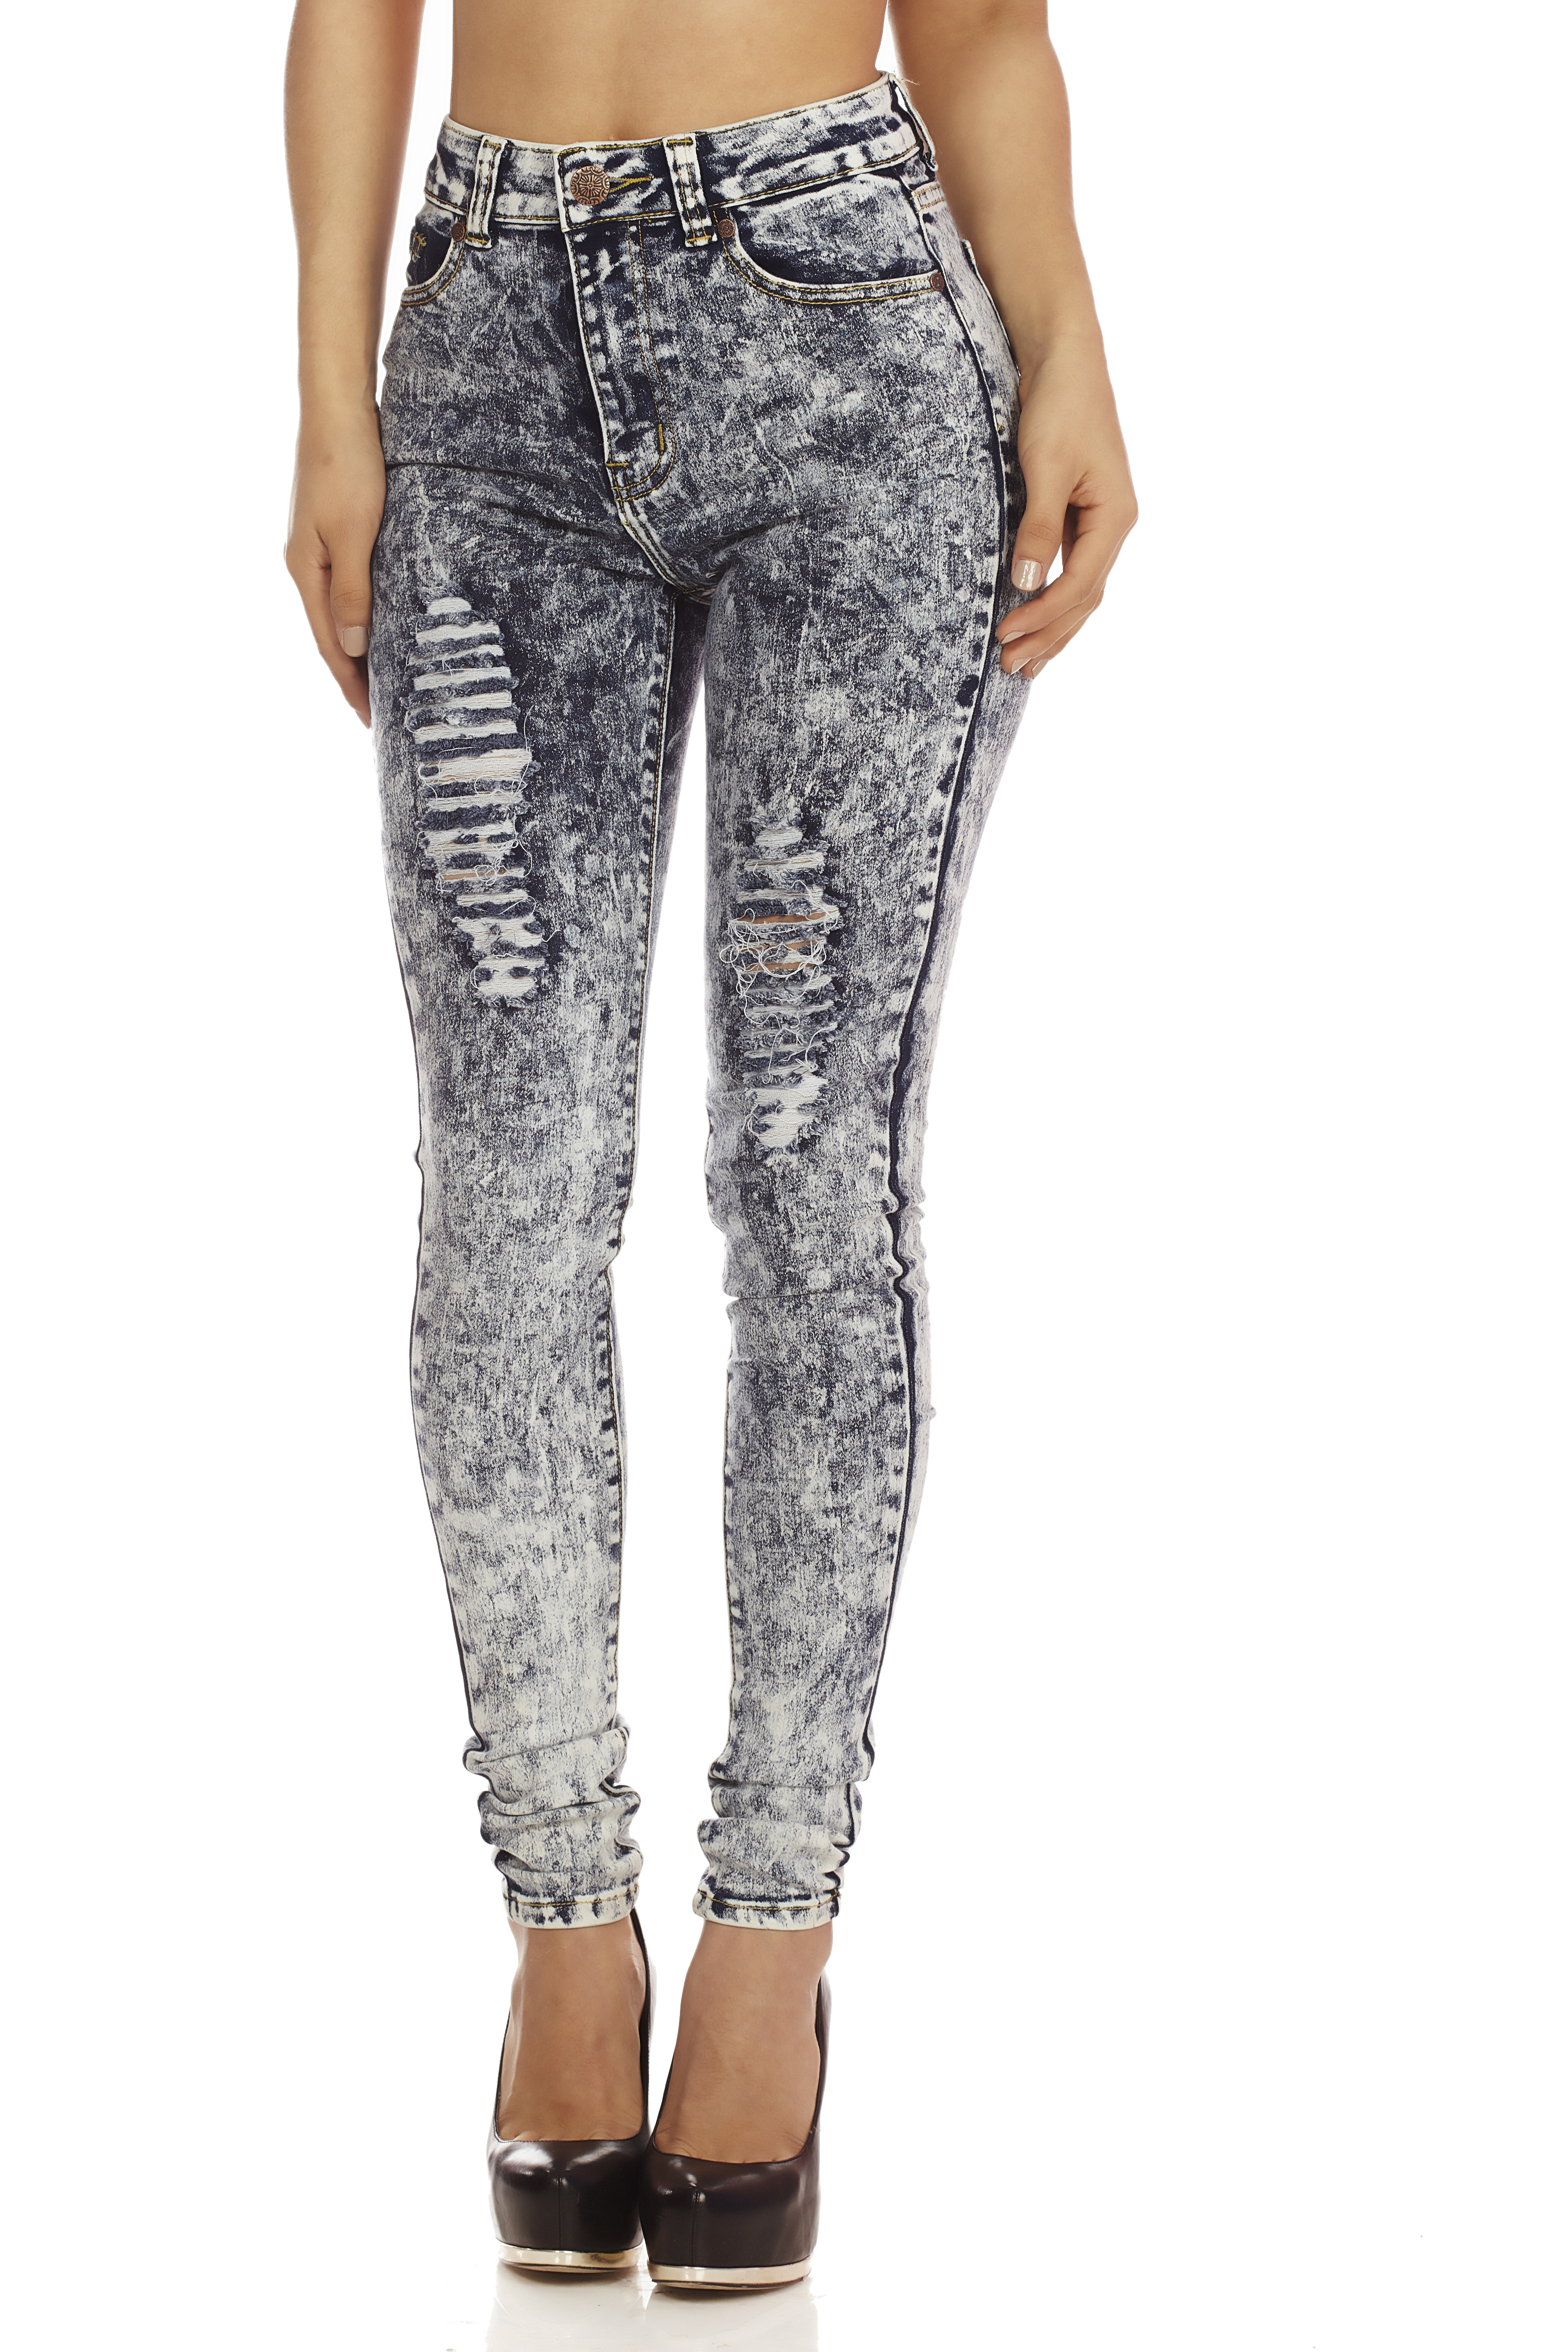 Distressed acid wash denim high waisted skinny jeans